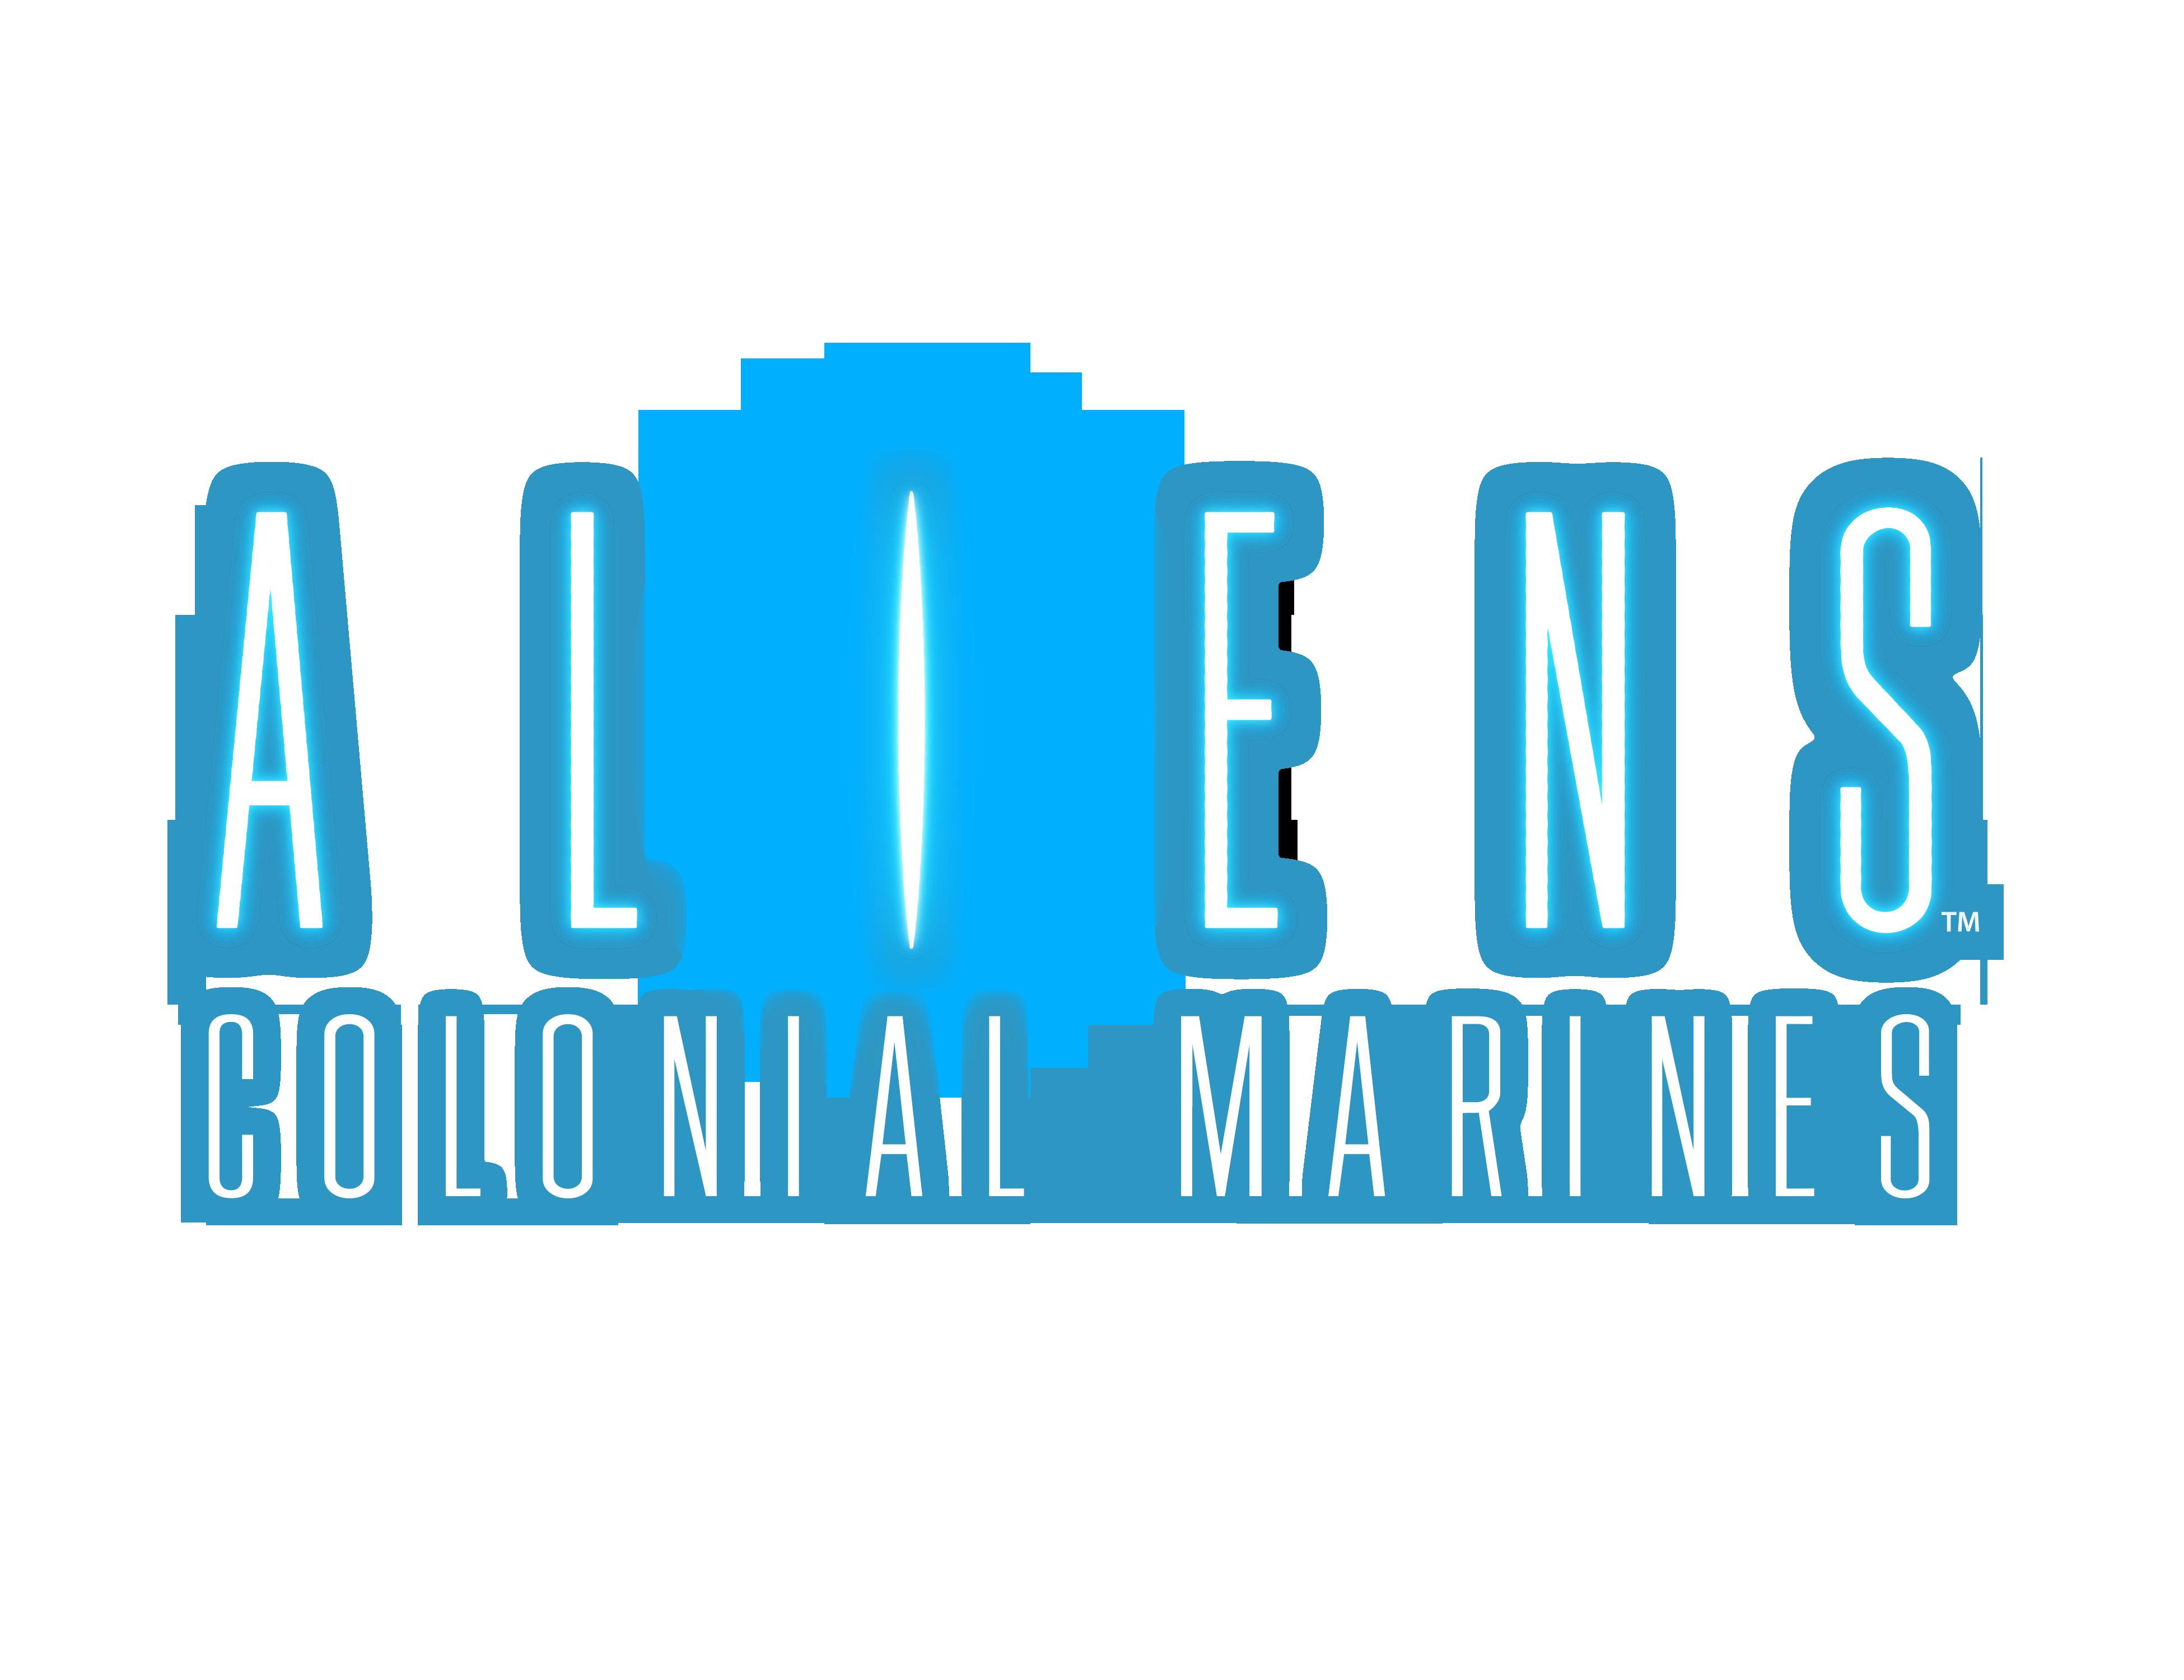 Aliens Colonial Marines [BlackBox] - FULL - Torrent indir ...